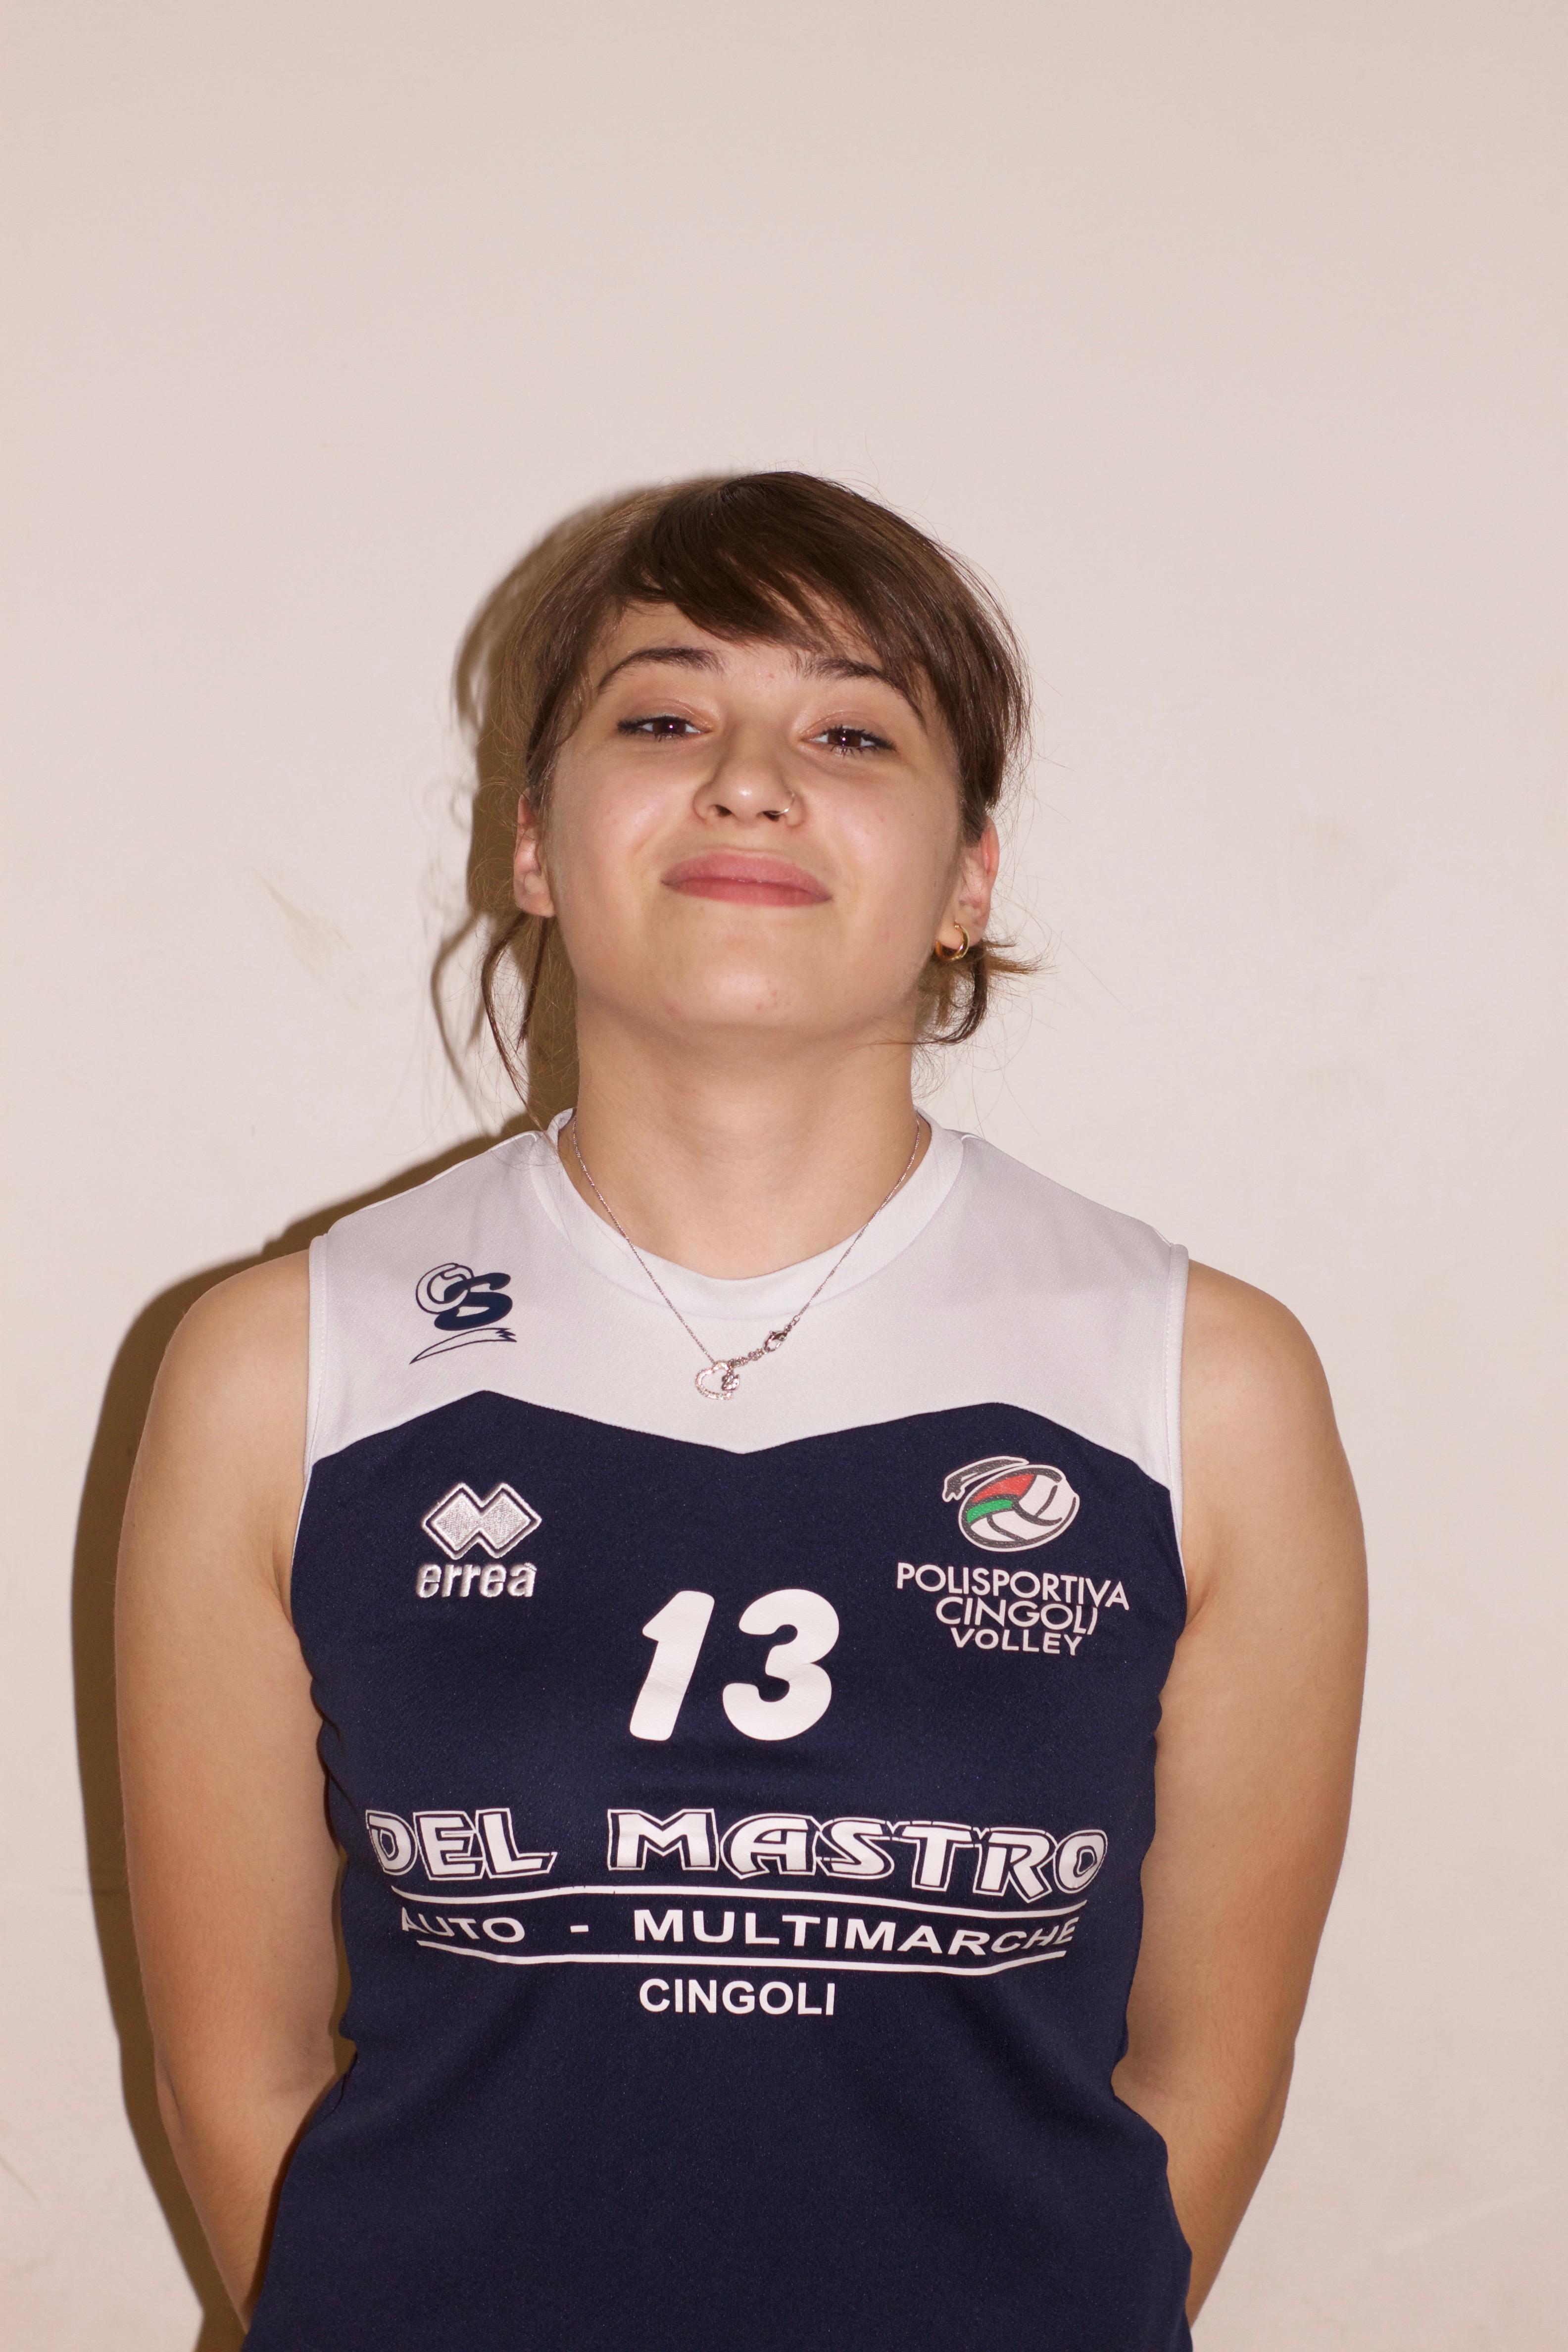 13 – Giulia Rotaru : Opposta